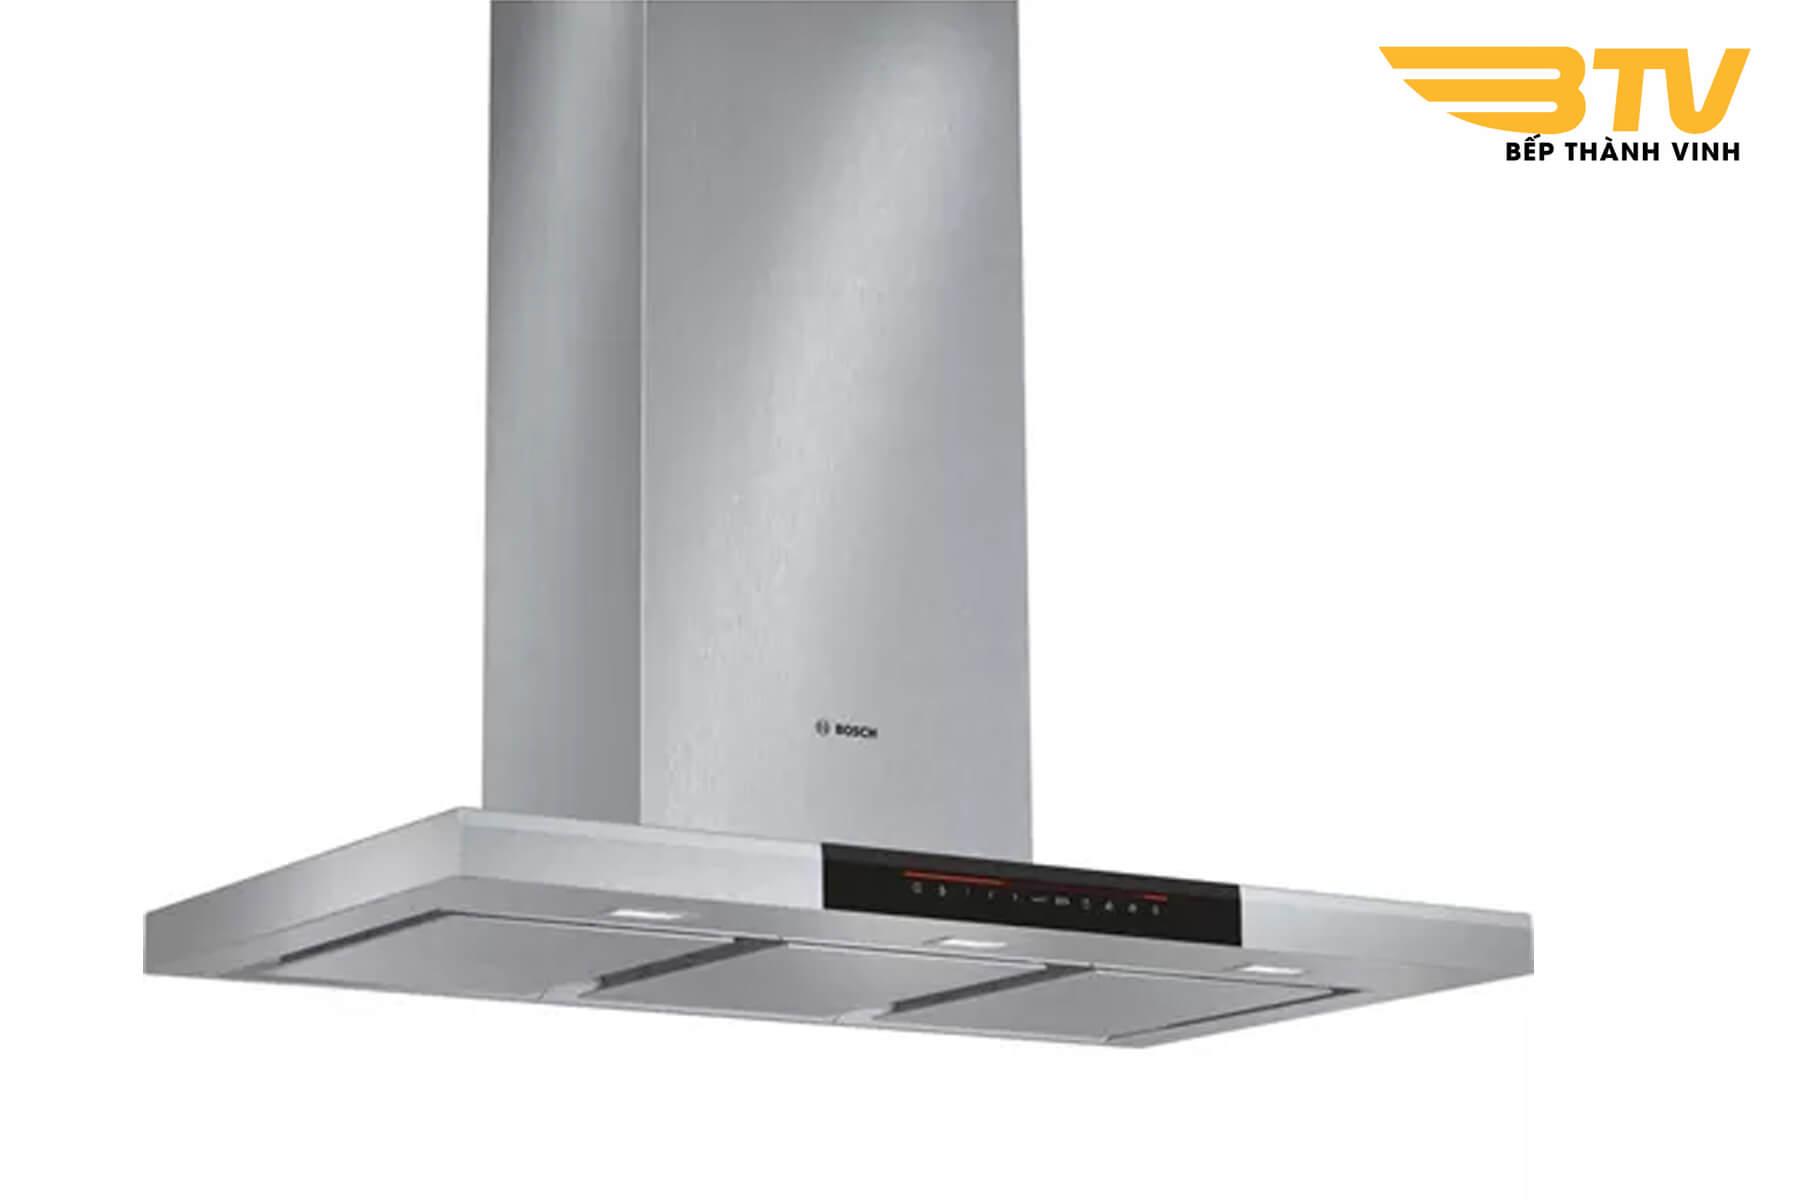 Máy hút mùi Bosch DWB091K50